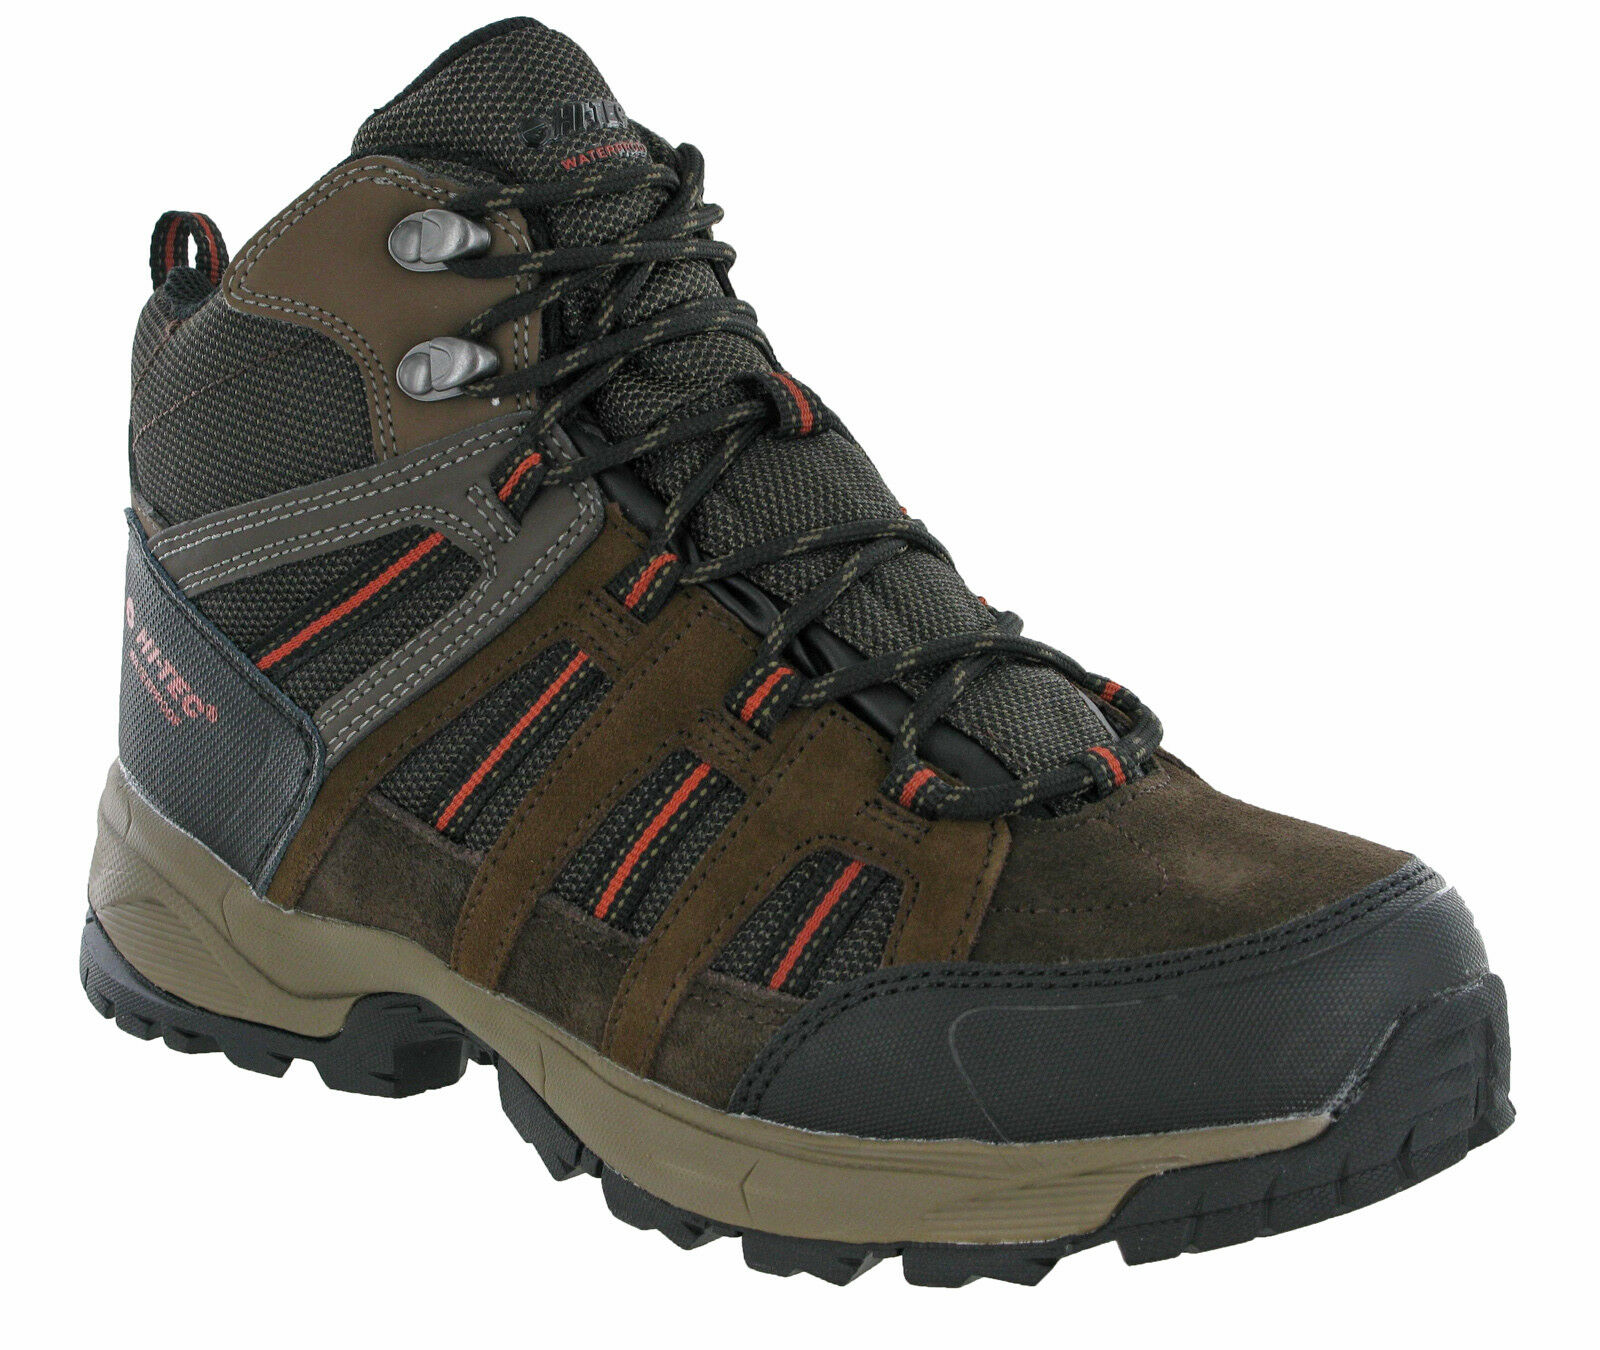 Hi-Tec Garcia Garcia Hi-Tec Sport Wasserfest Stiefel Wandern Trail Herren Wandern Schuhe 30a7f1